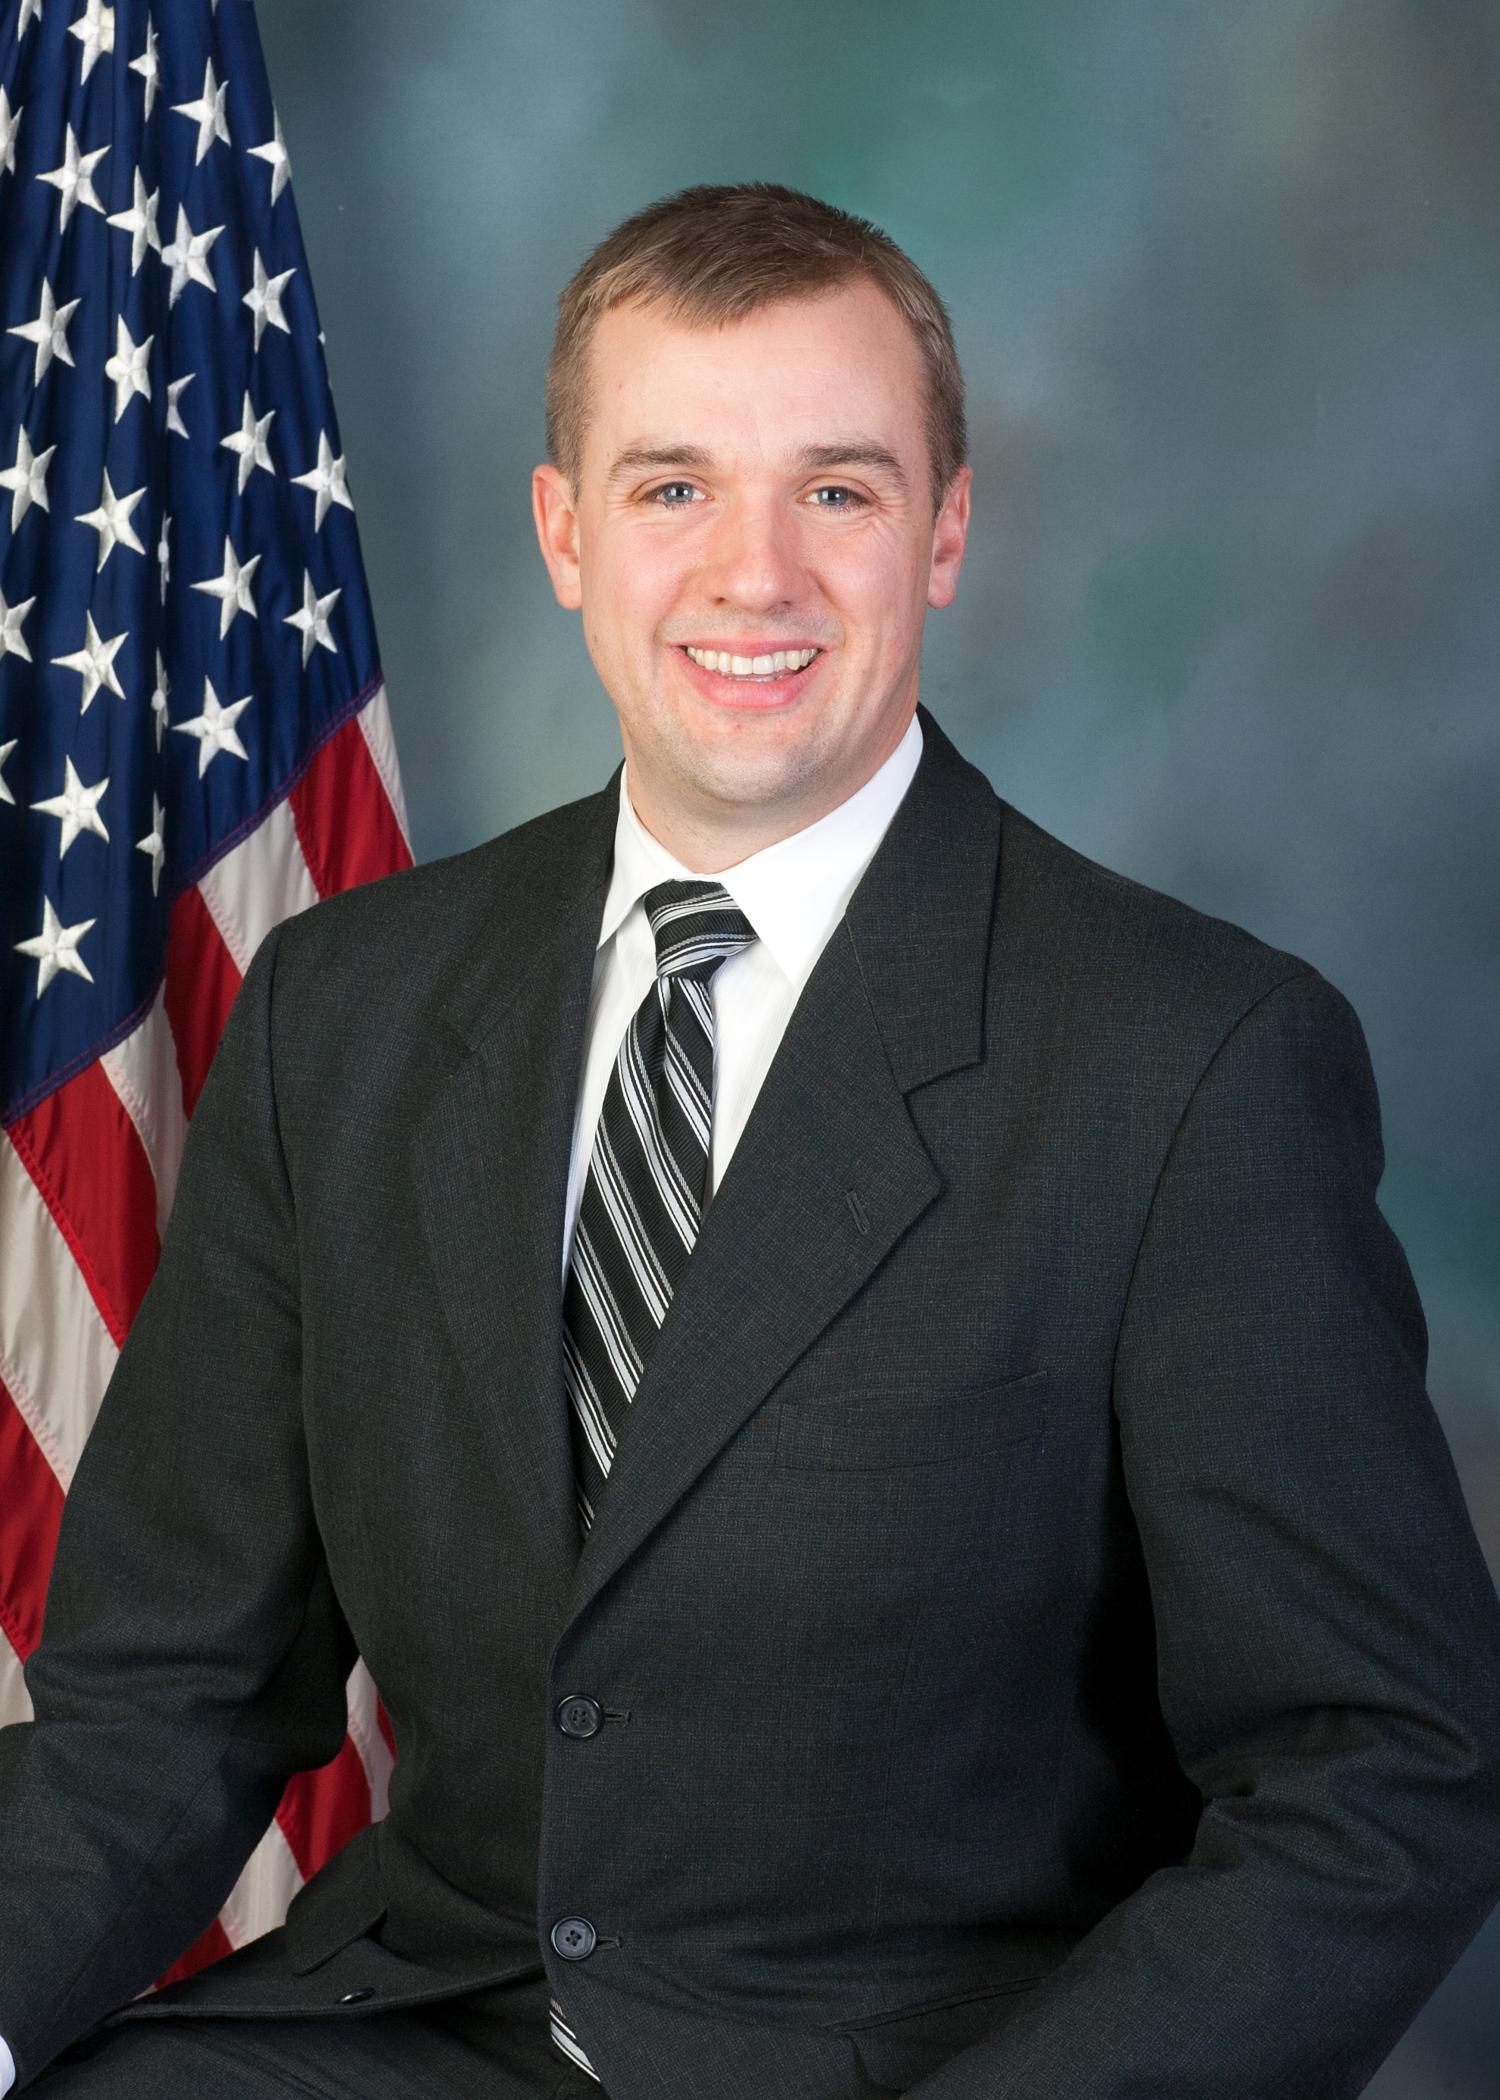 Representative Bryan Cutler